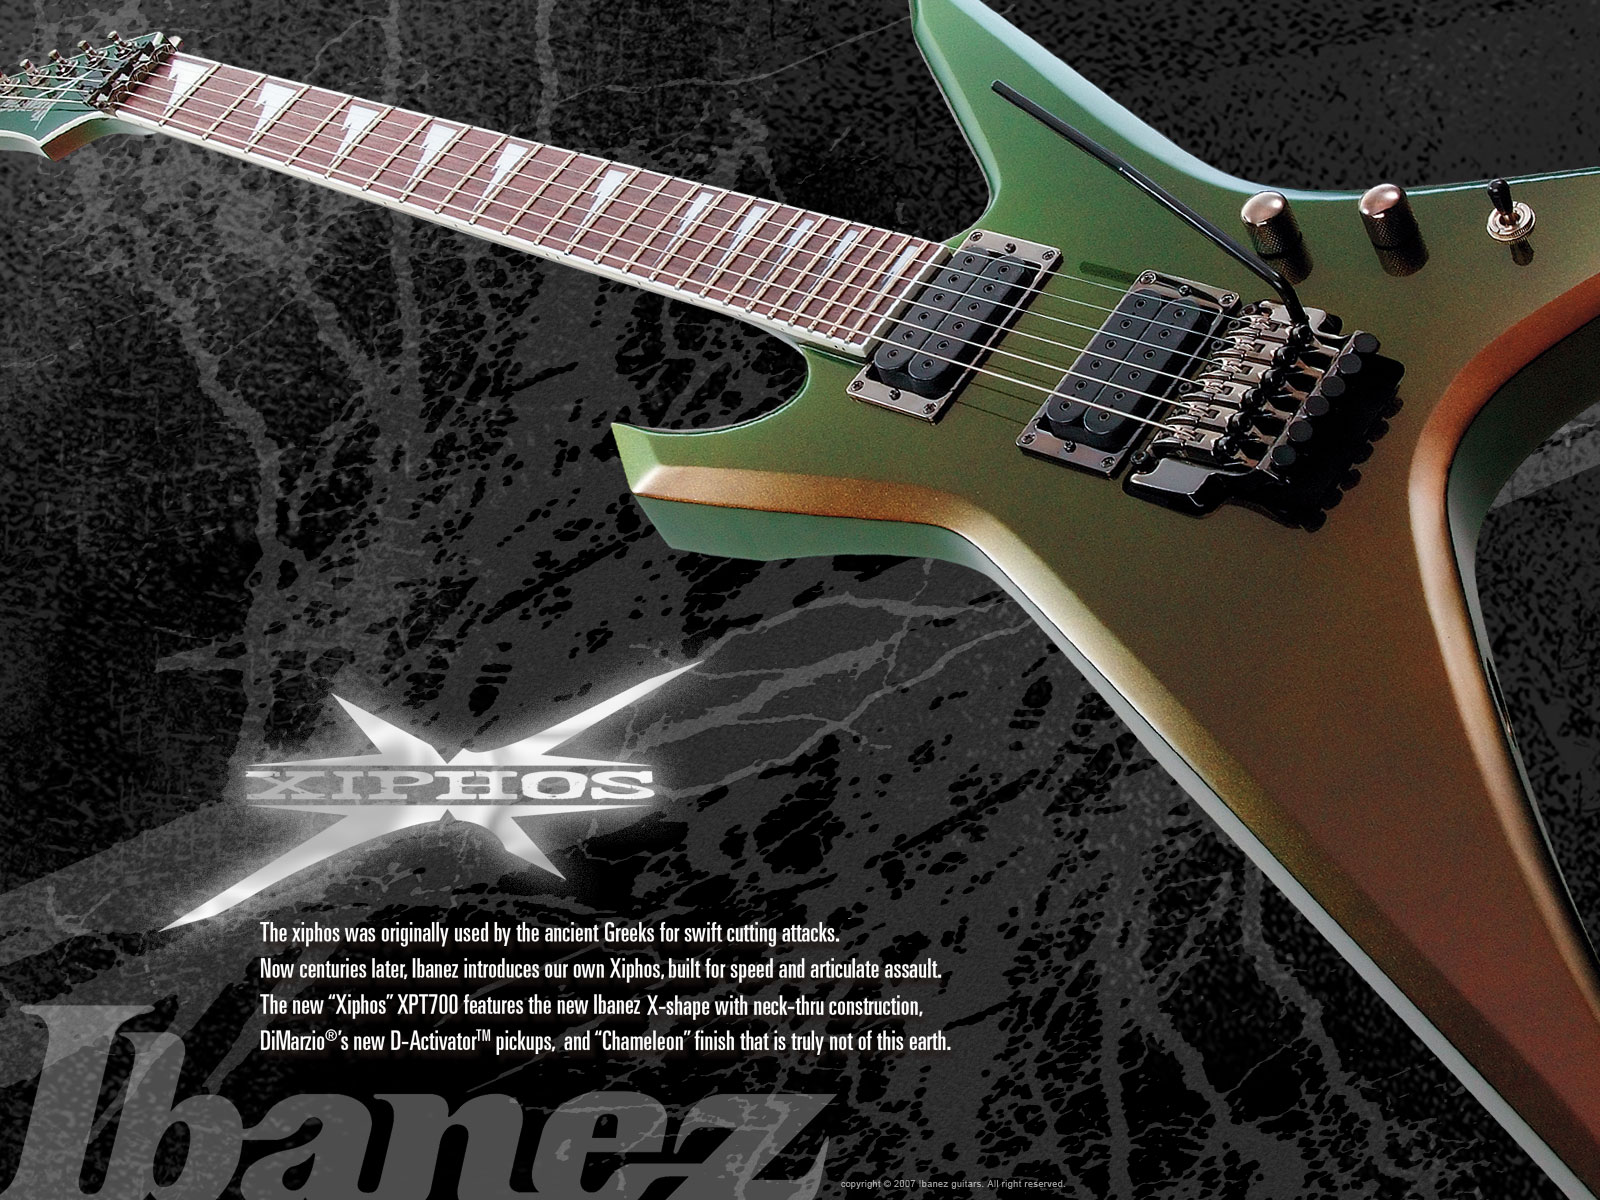 Guitars Ibanez Wallpaper 1600x1200 Guitars Ibanez 1600x1200